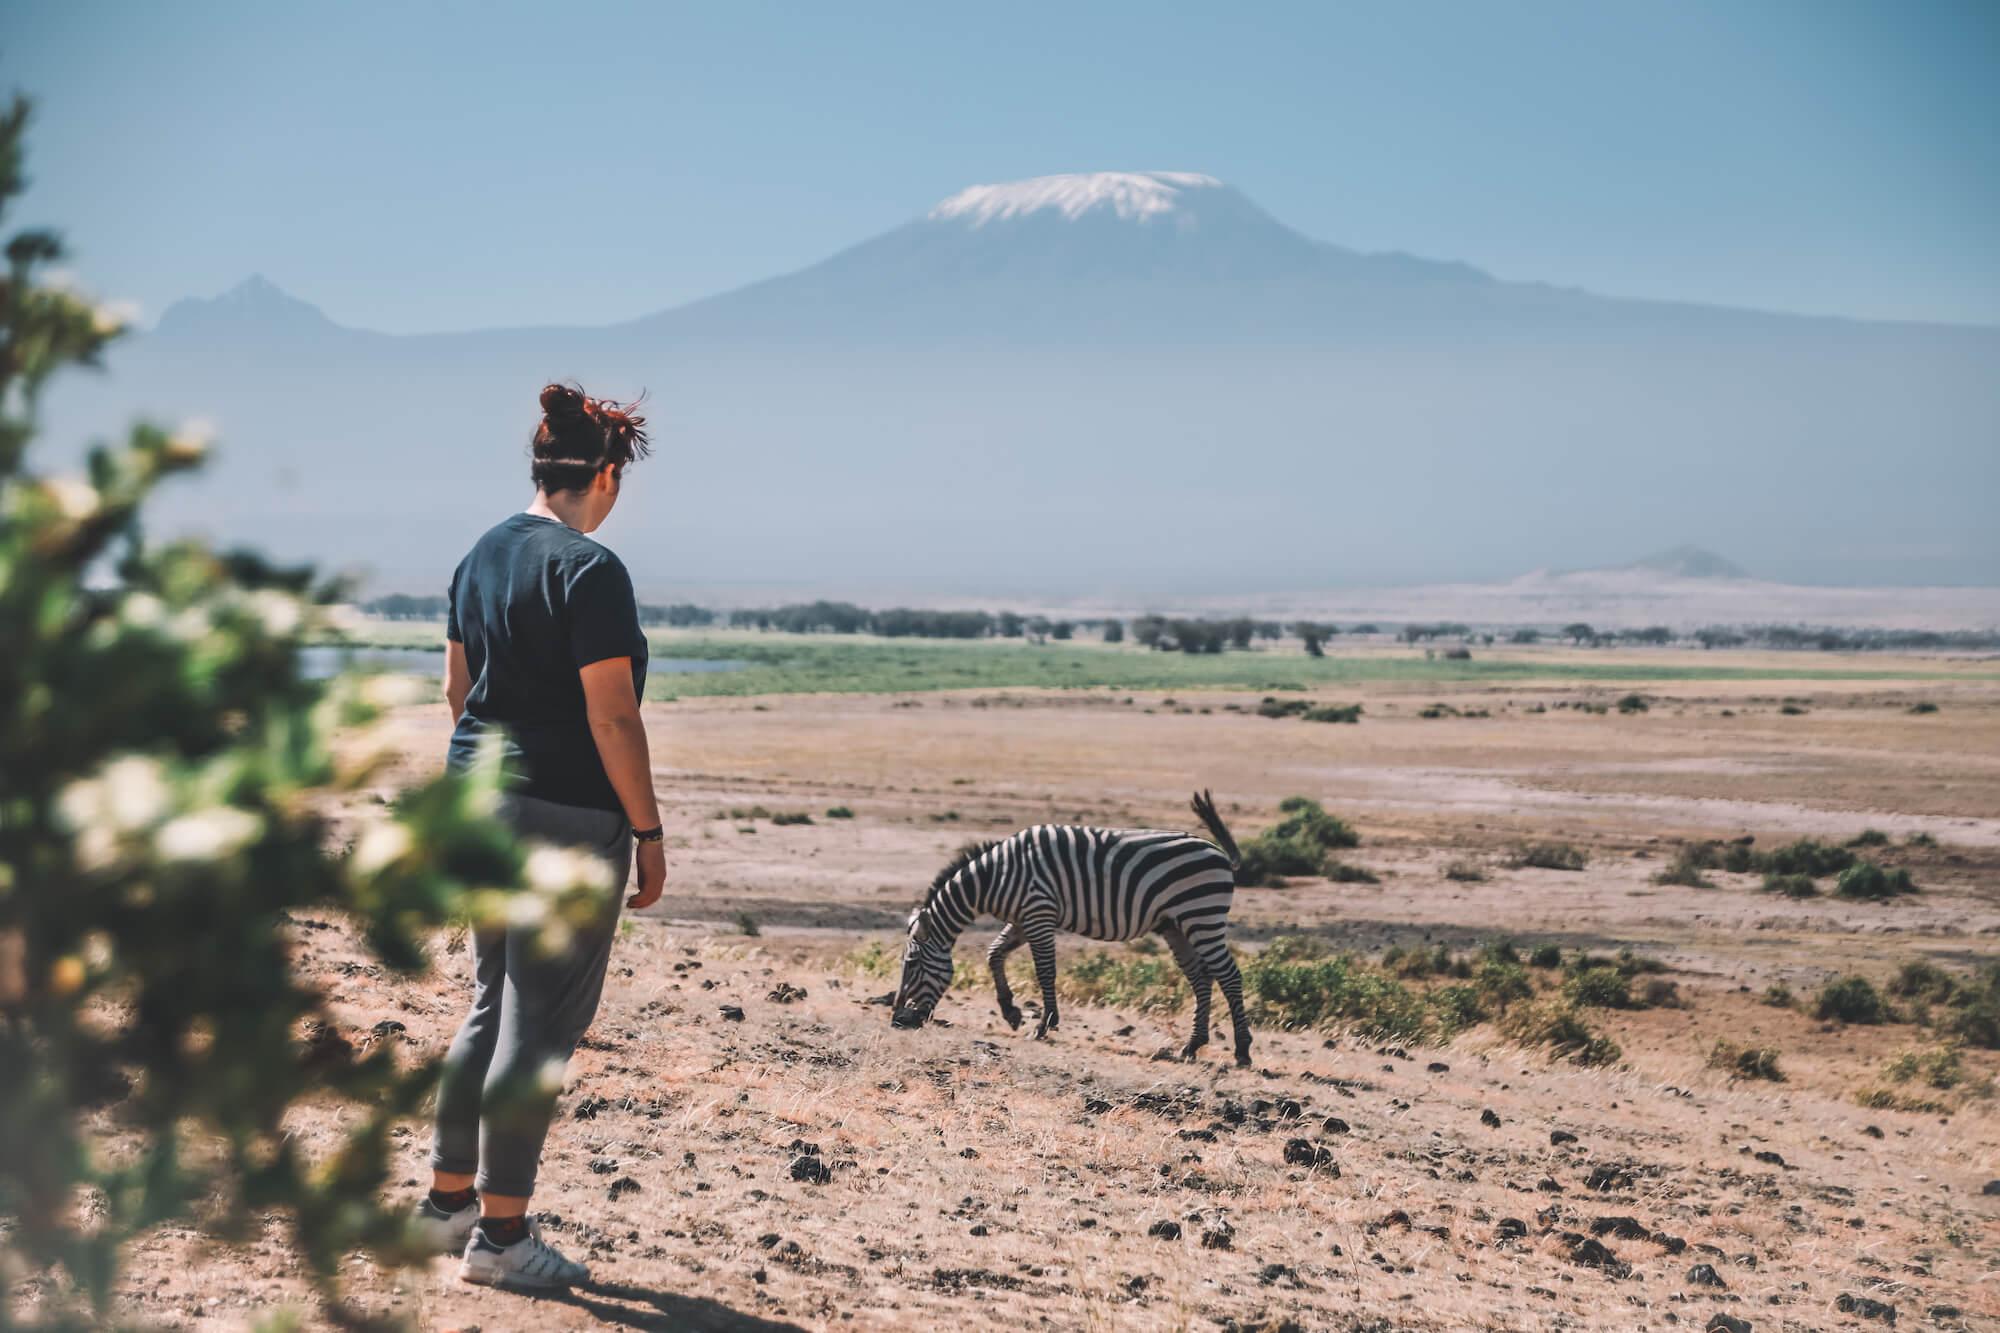 kilimandjaro zèbre safari pied